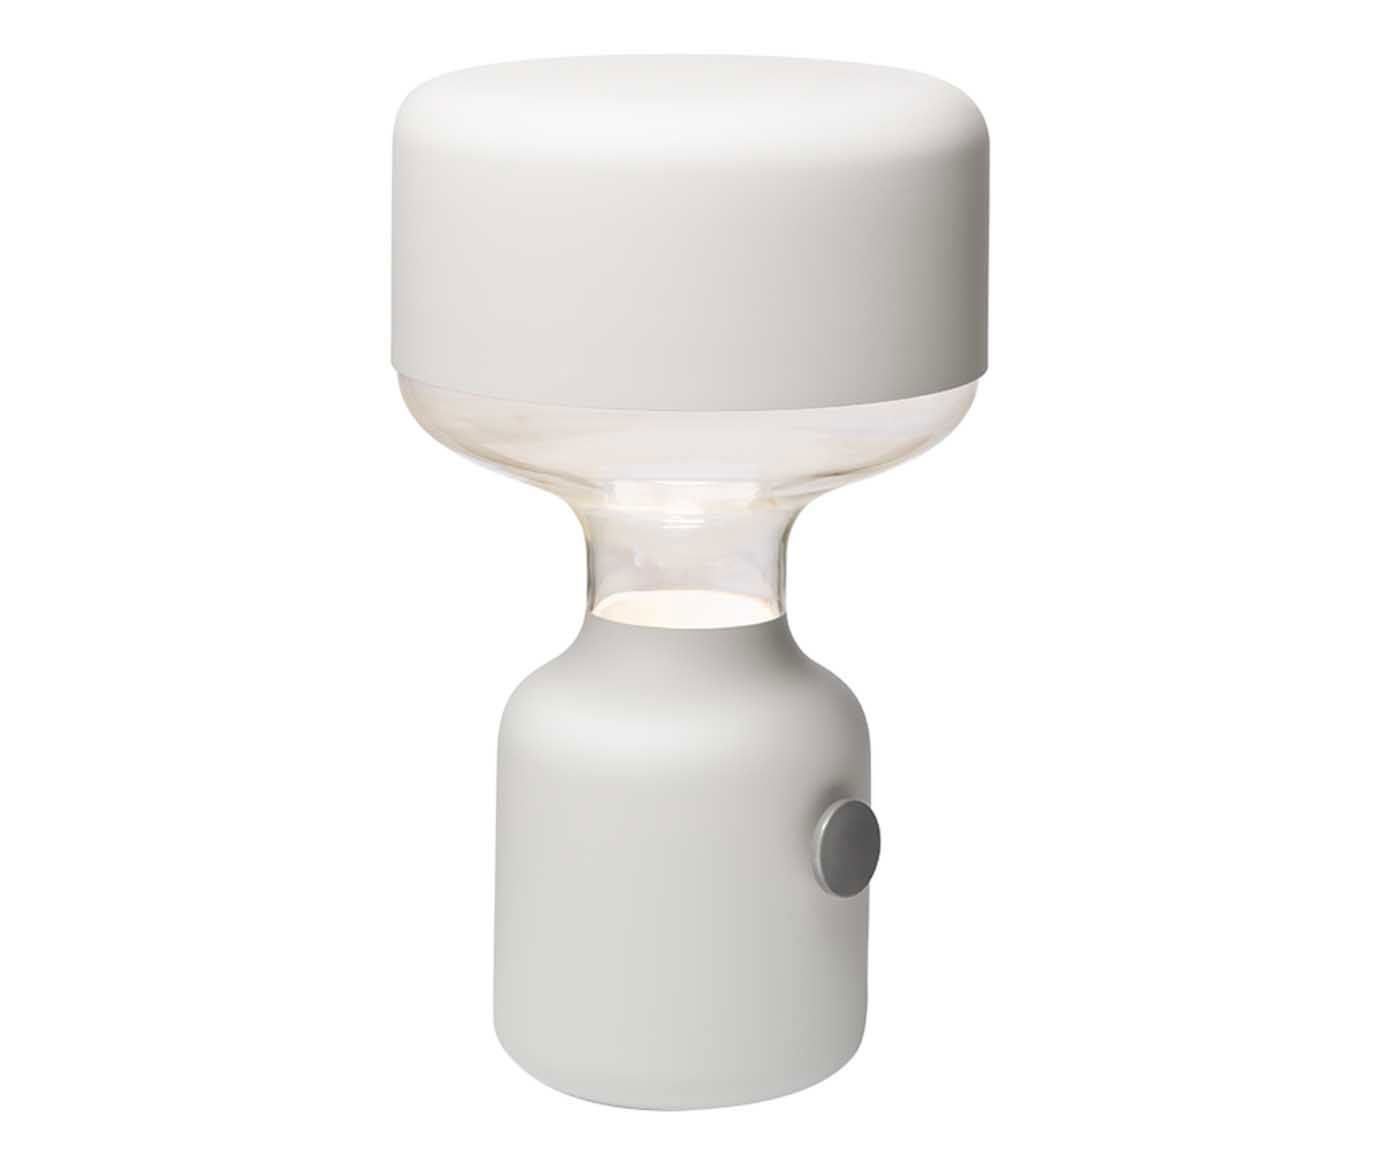 Abajur jinn - la lampe | Westwing.com.br